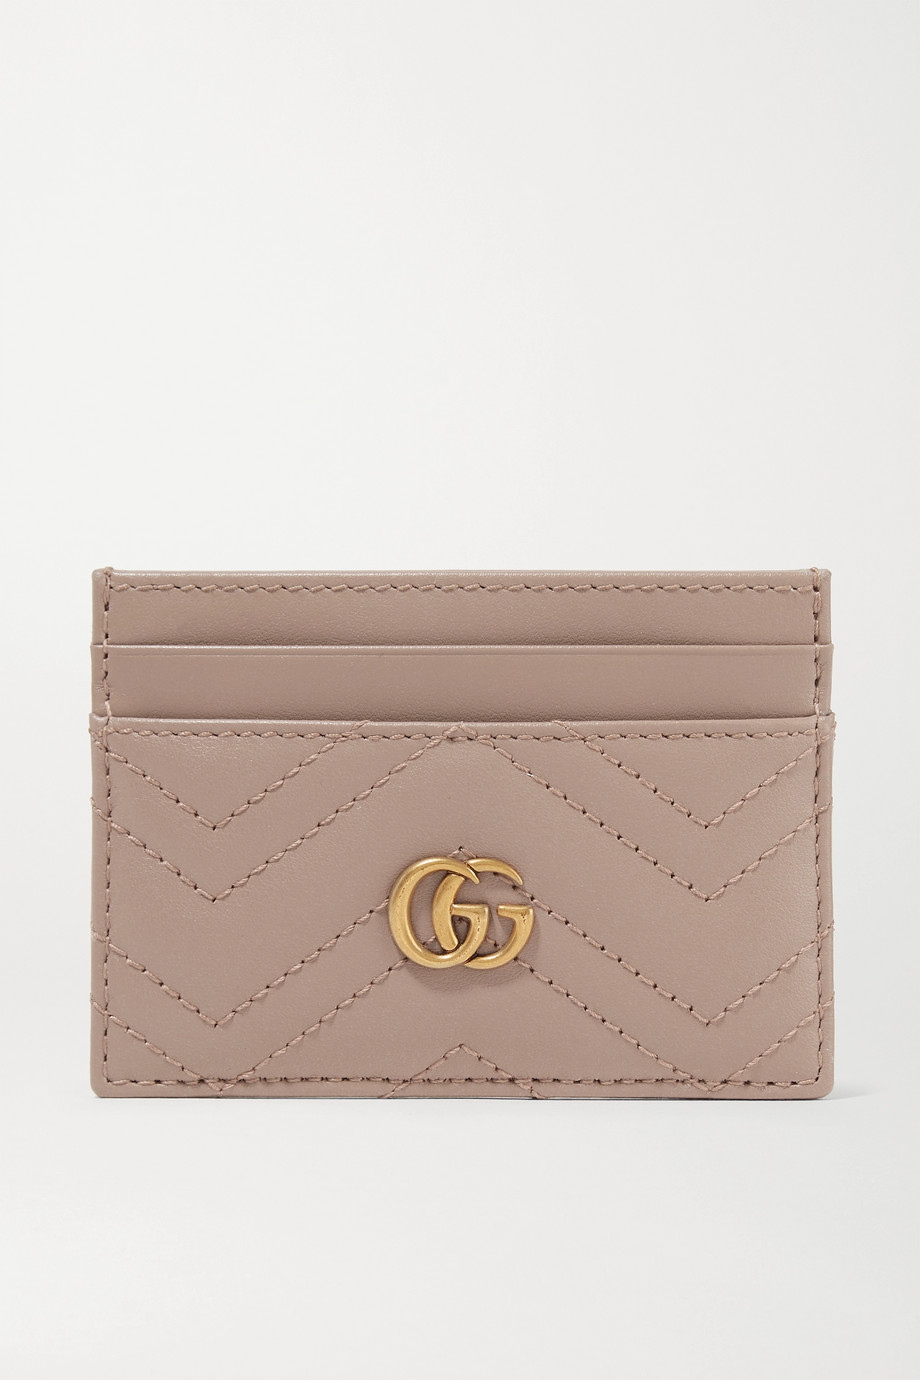 Gucci GG Marmont 绗缝皮革卡夹